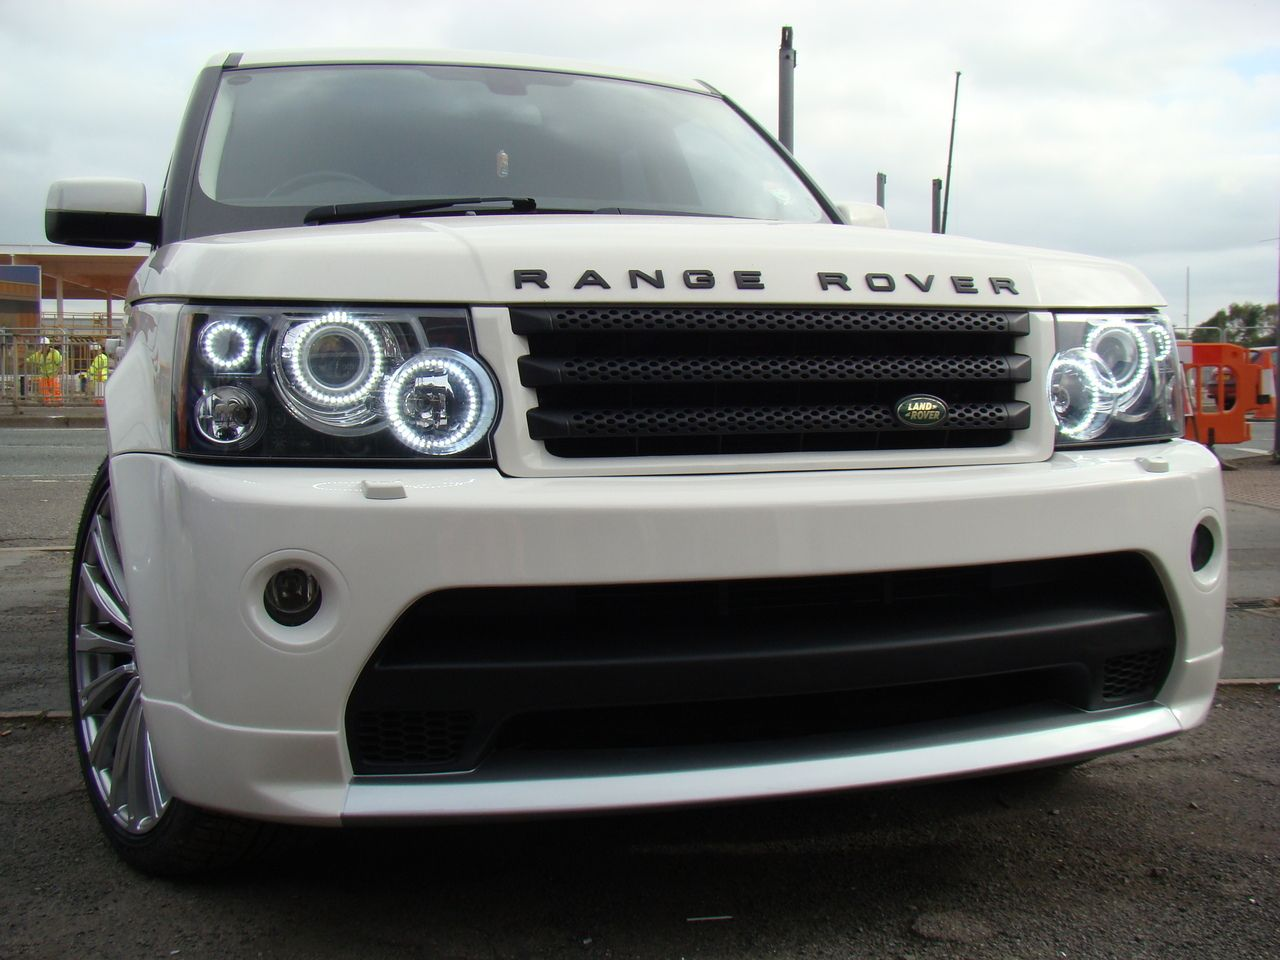 20 Range Rover Sport Modifications Ideas Range Rover Sport Range Rover Land Rover